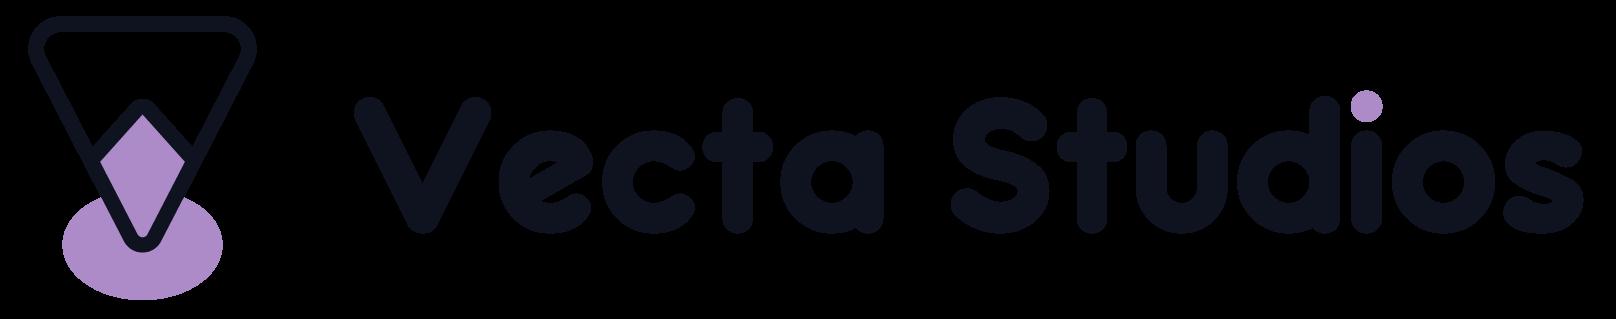 Vecta Studios